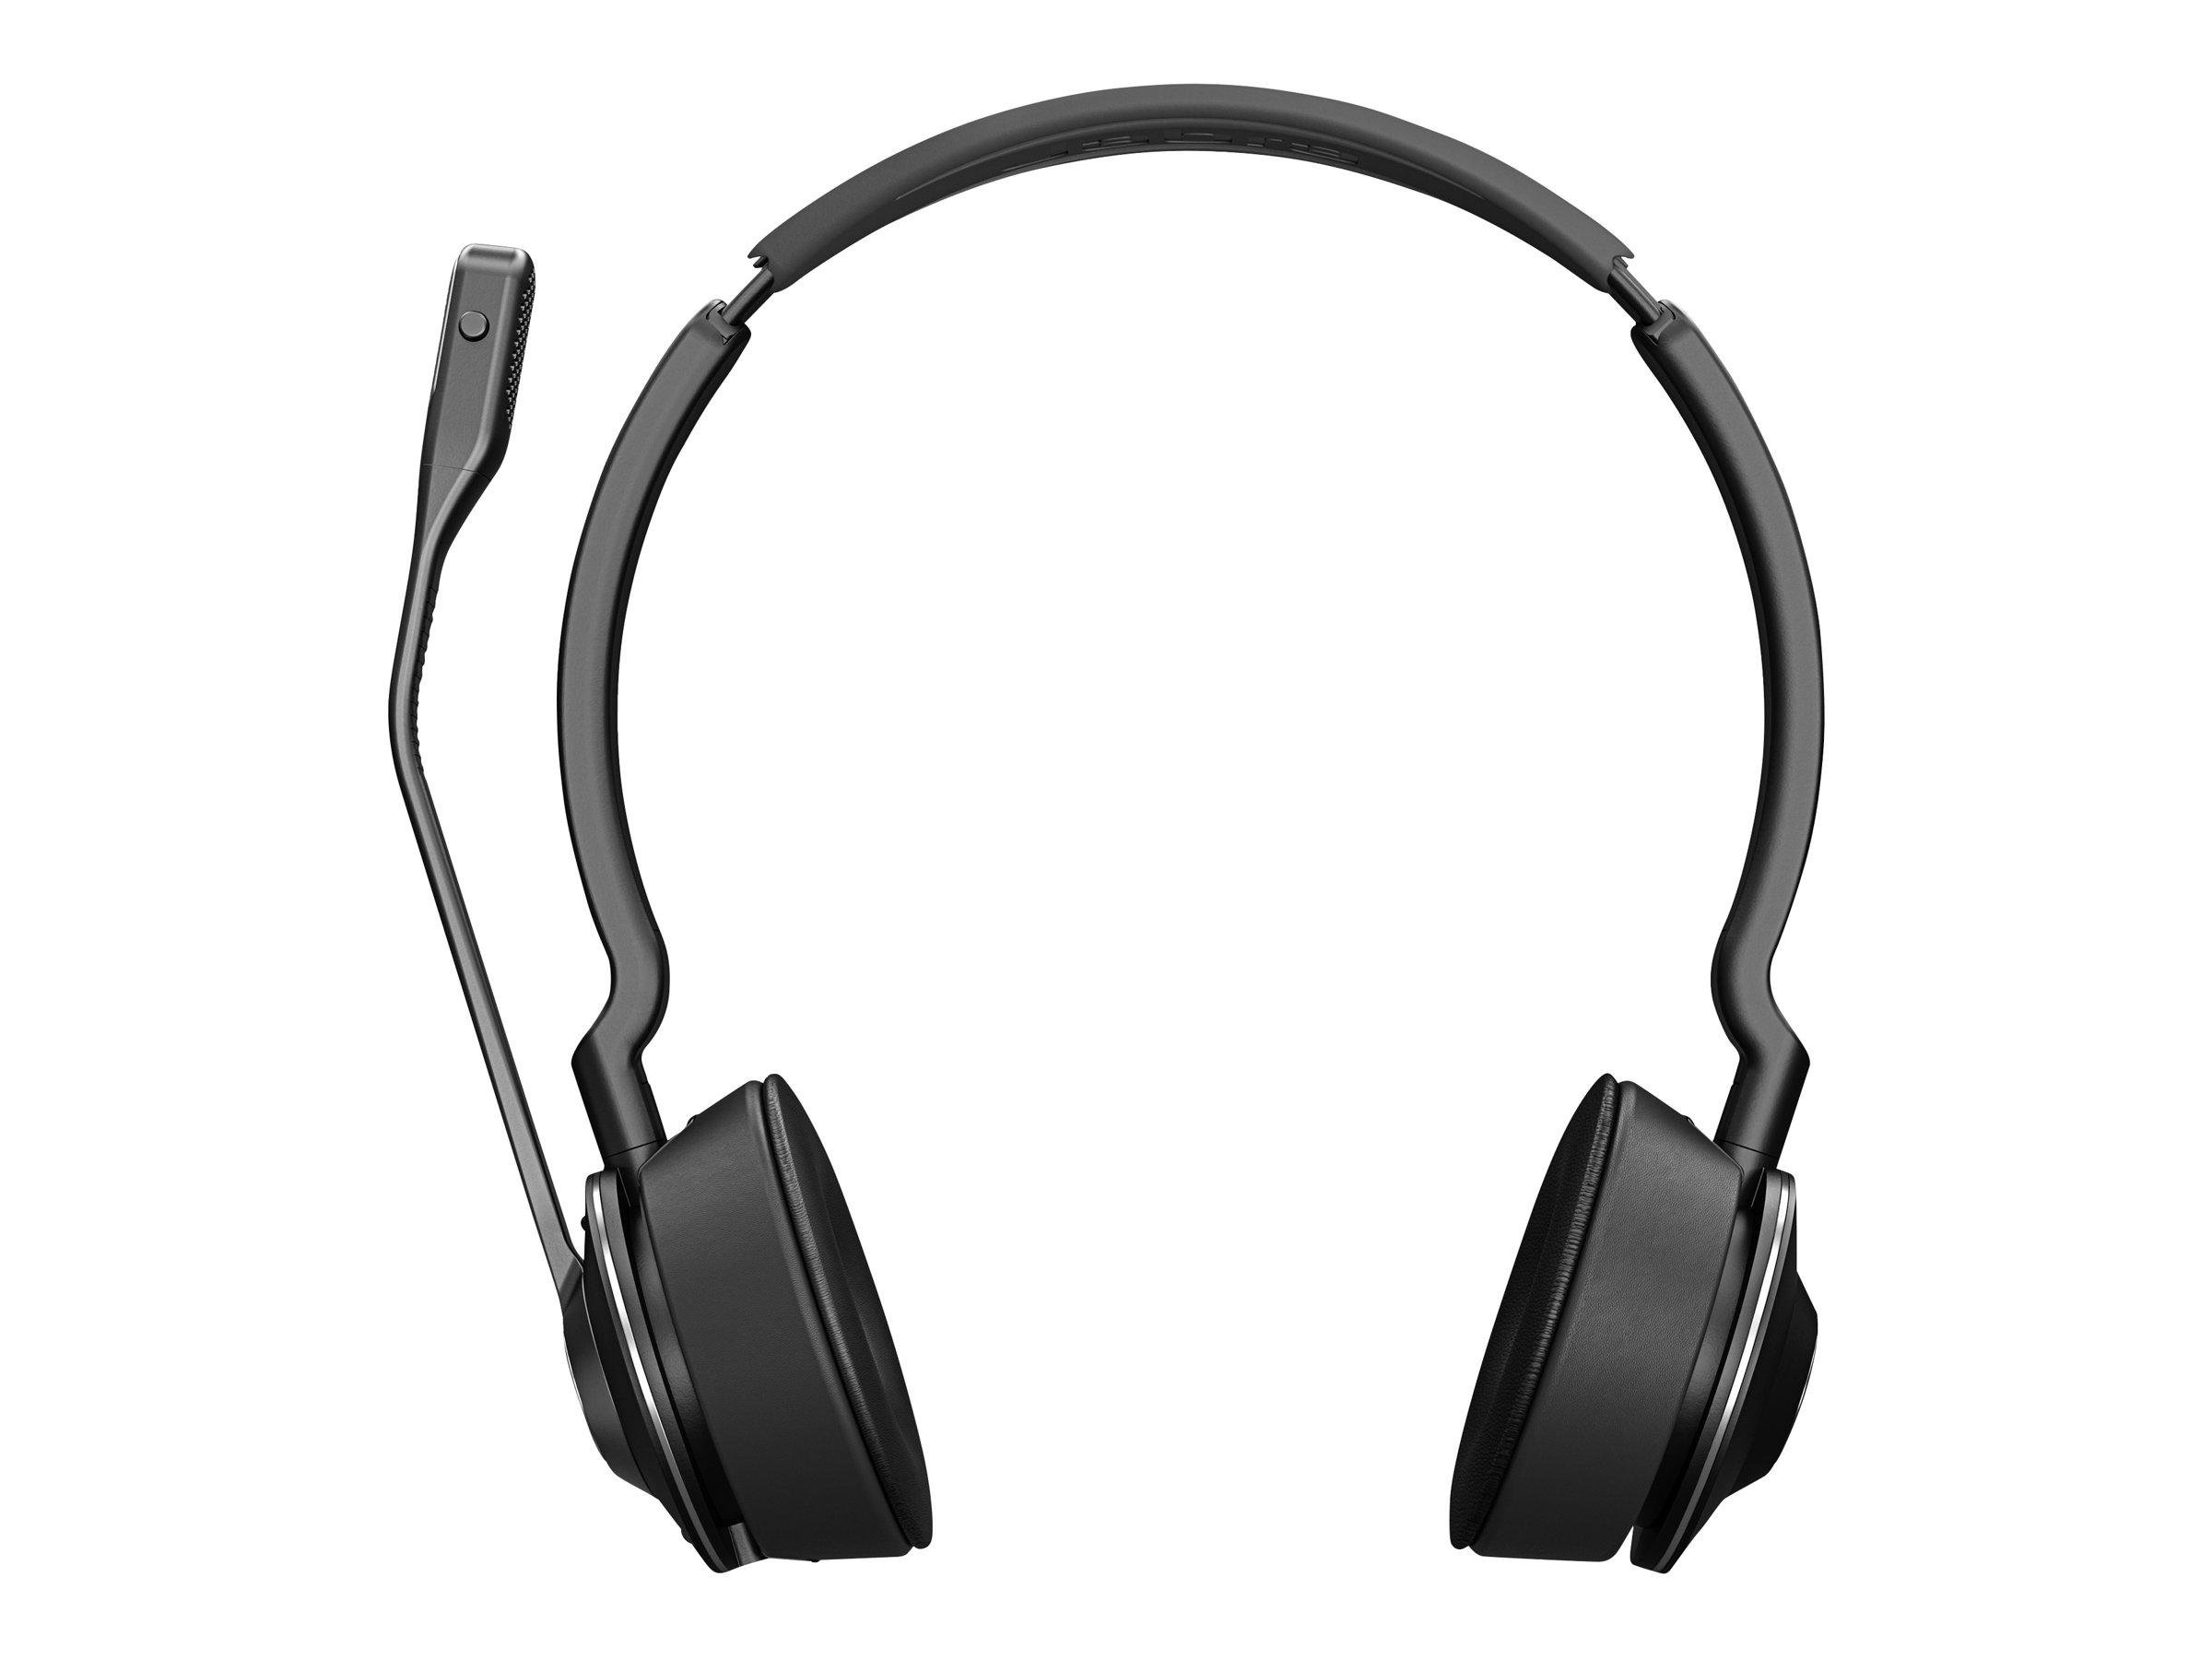 Jabra Engage - Ersatzeinheit - Headset - On-Ear - DECT / Bluetooth - kabellos